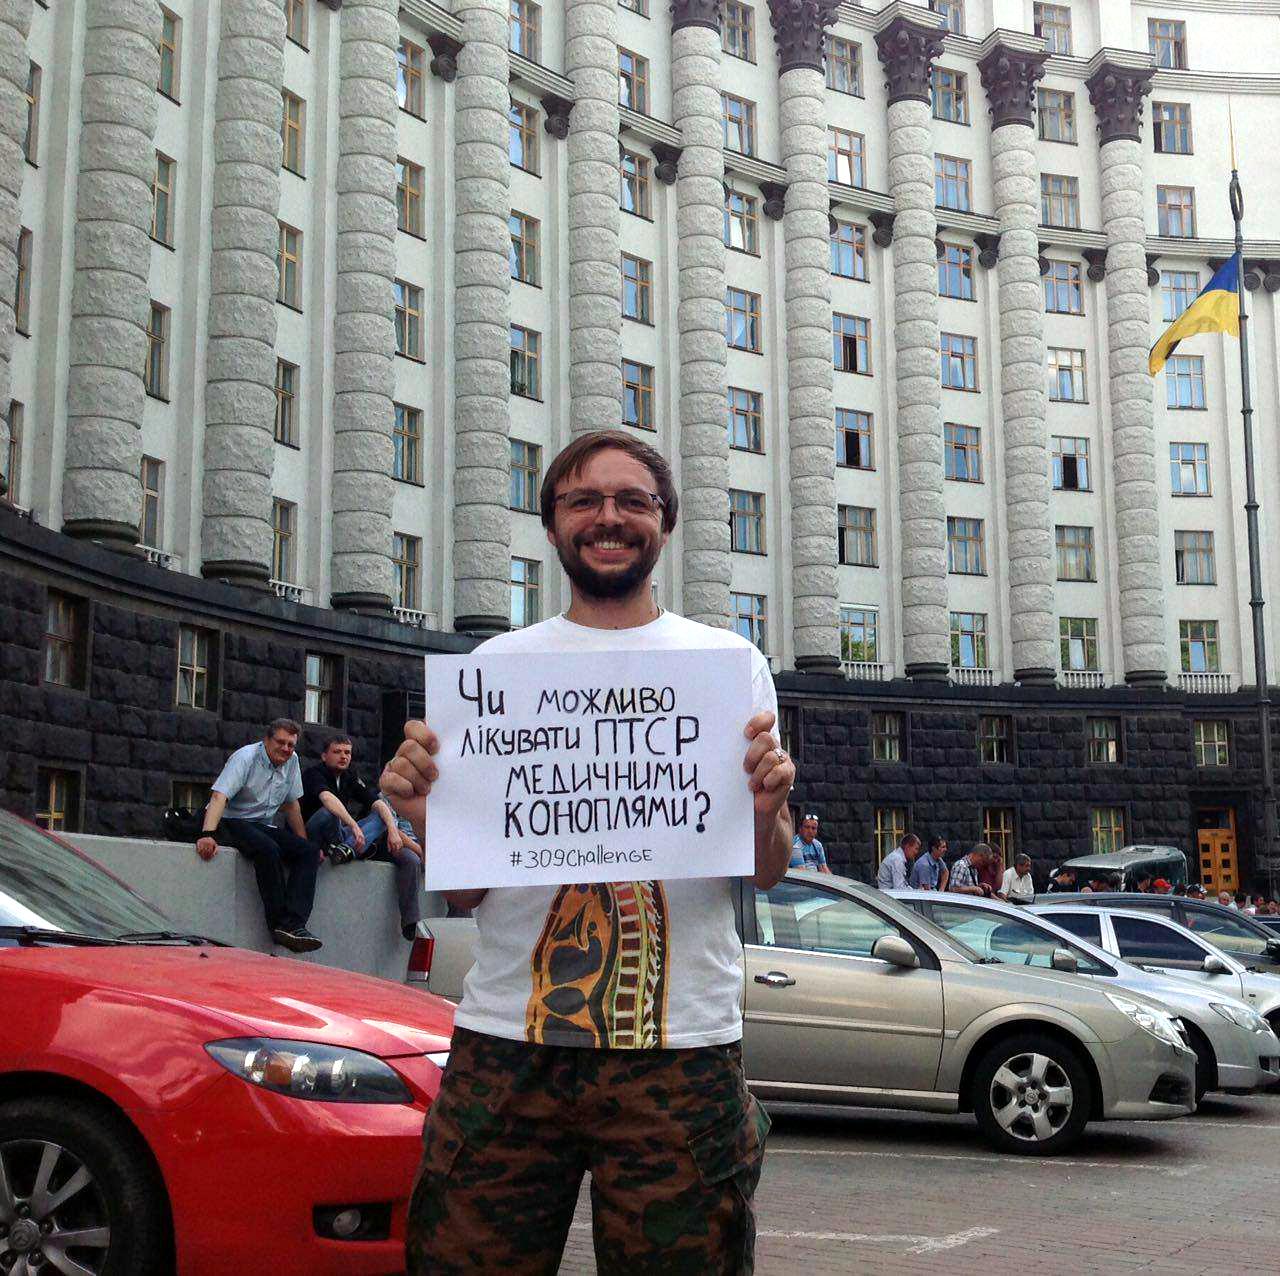 Дмитрий Шамрай ПТСР. Фото из Facebook